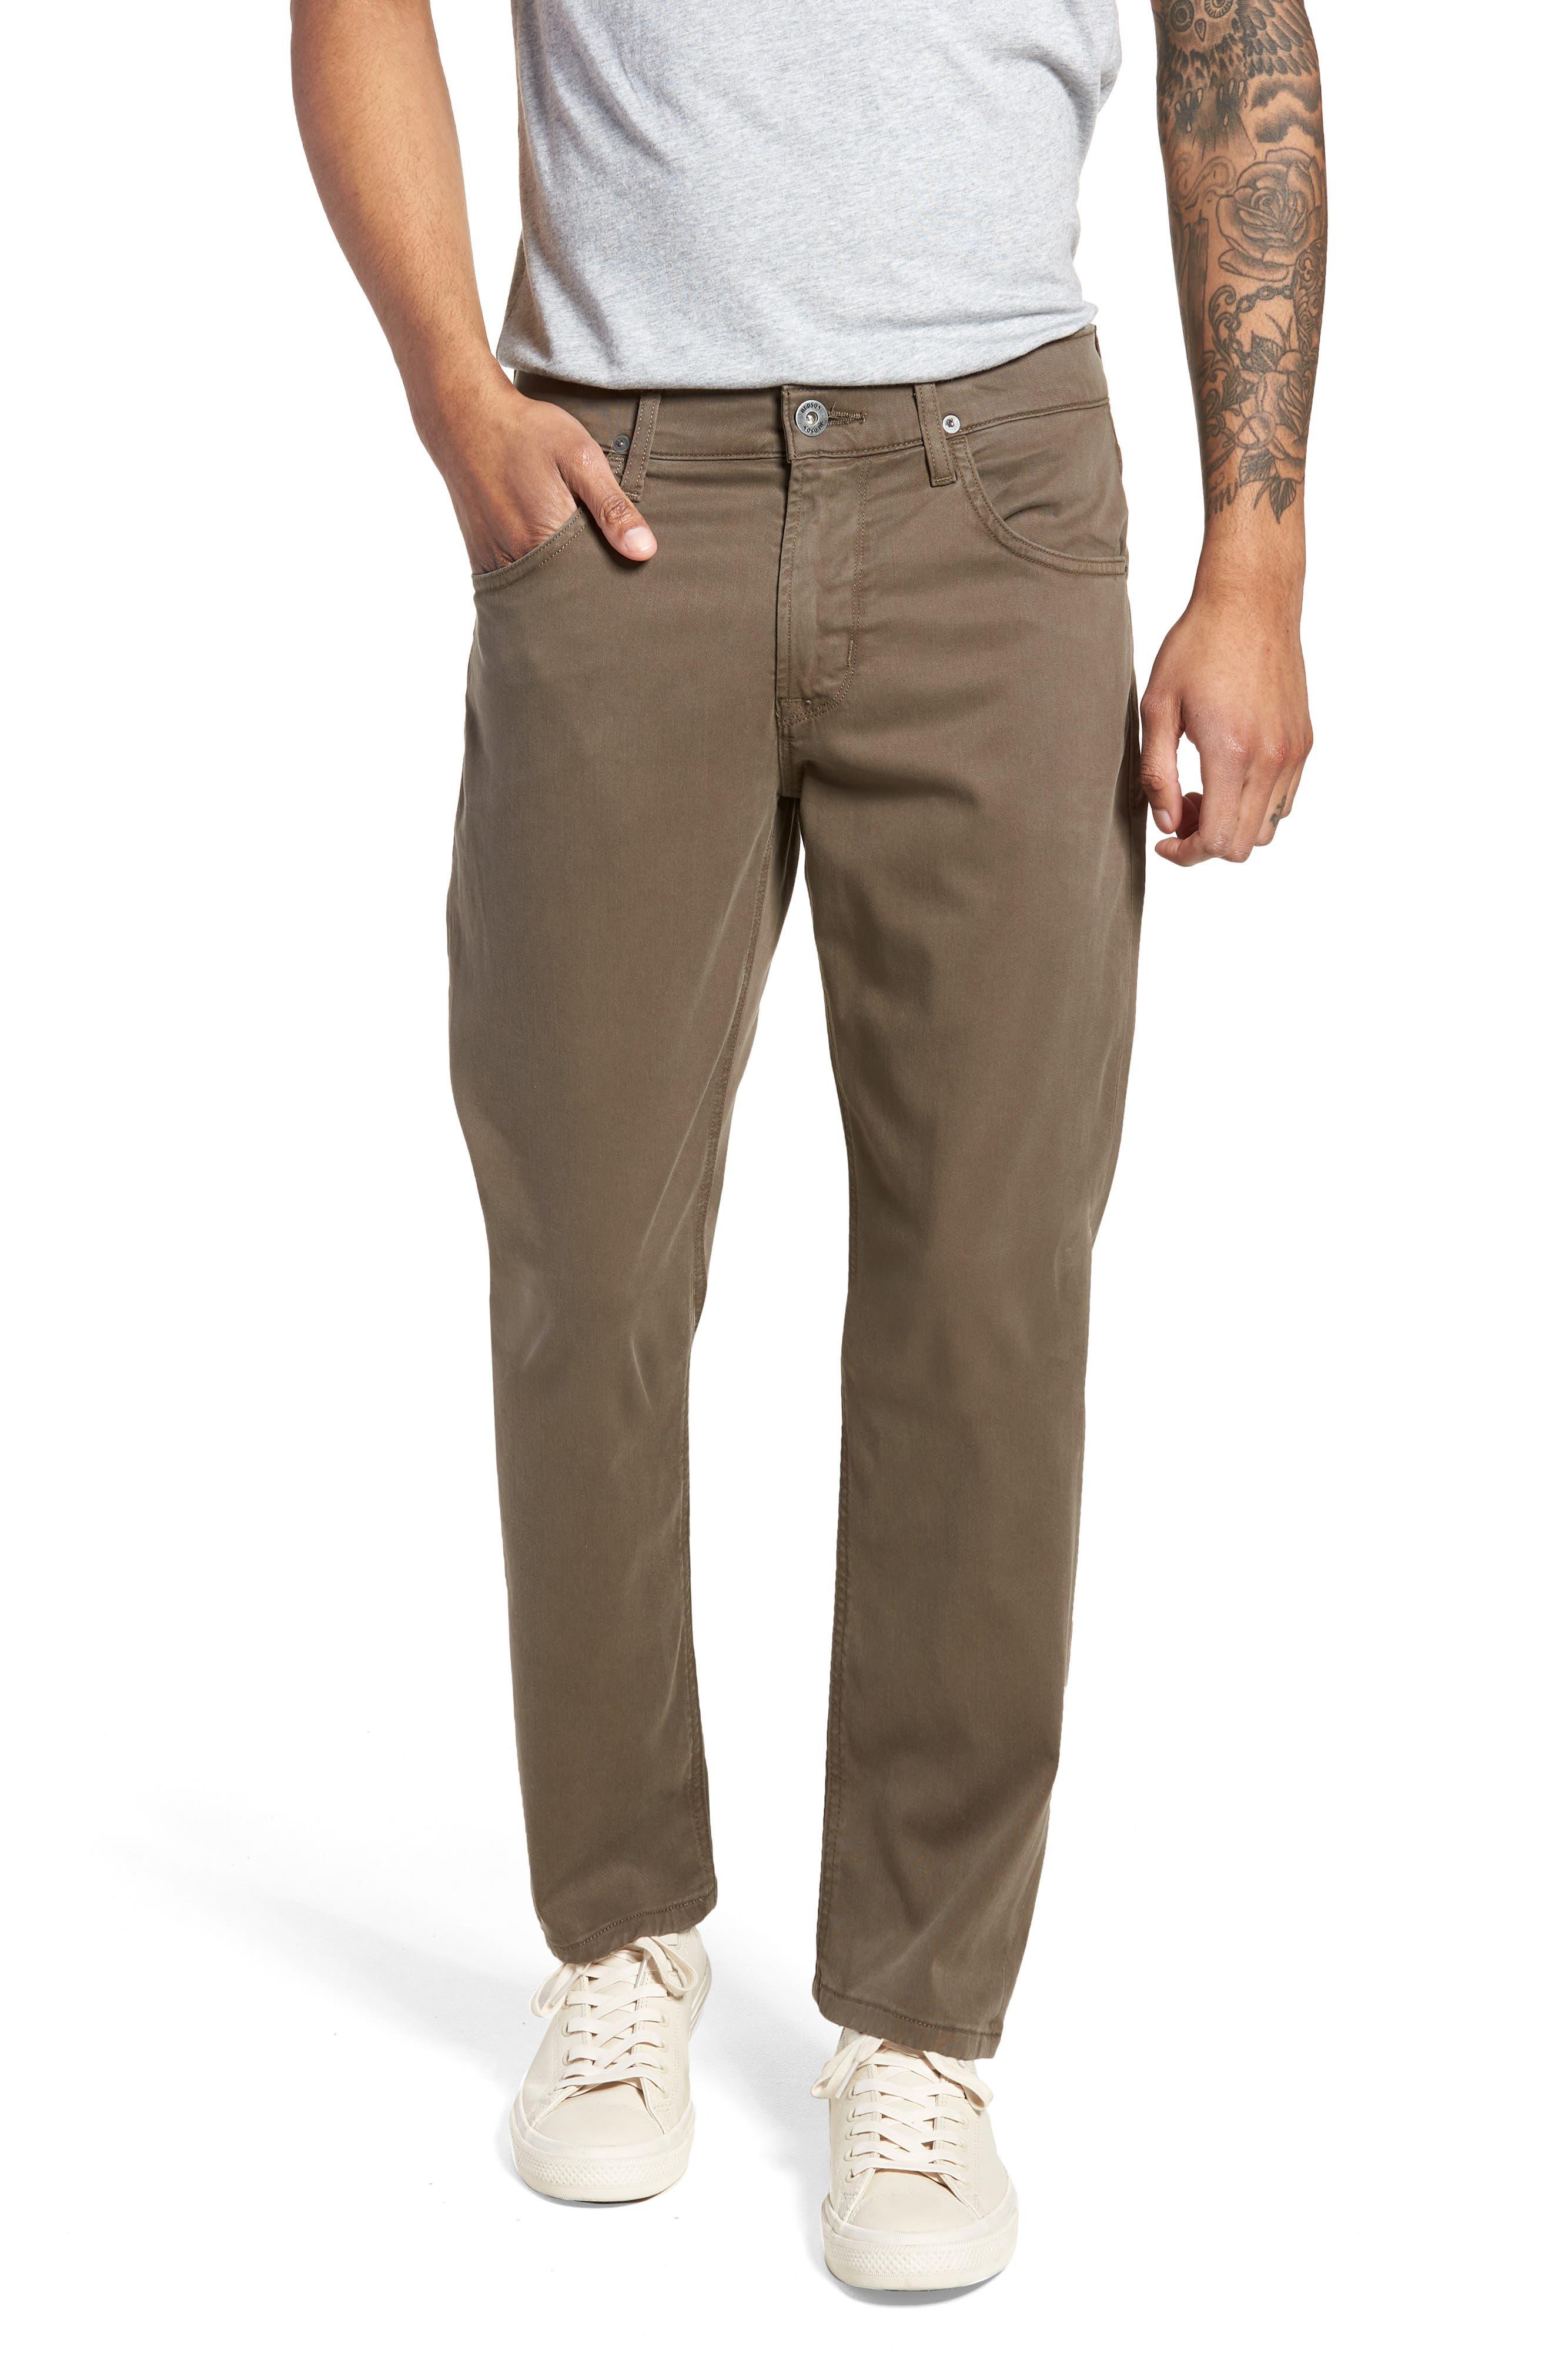 Blake Slim Fit Jeans,                         Main,                         color, Plaster